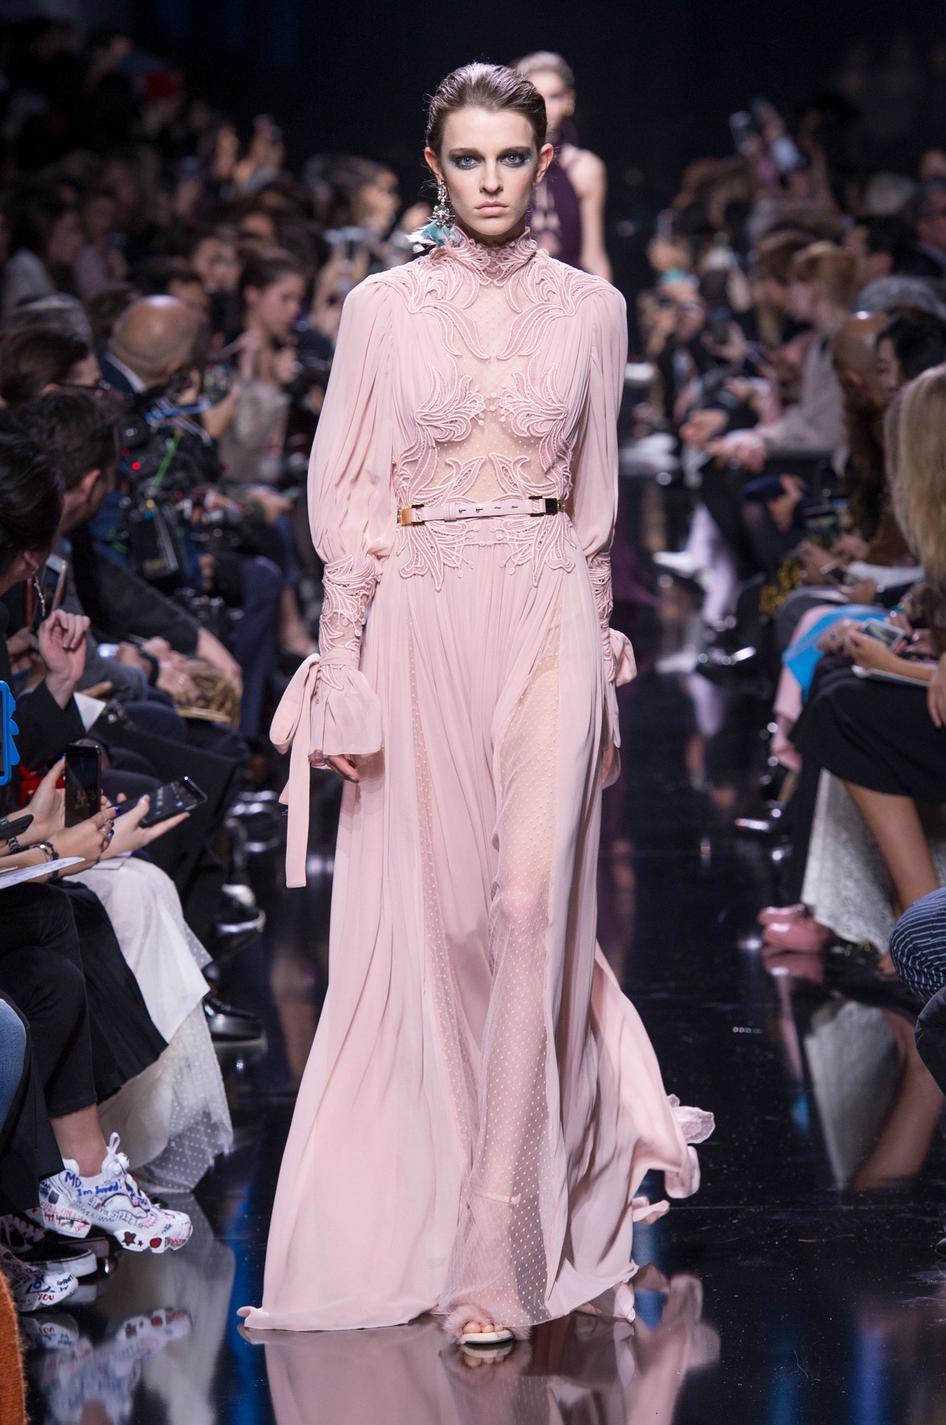 54236ad4b97 ... Week automne-hiver 2017-2018   ces robes qui font rêver - Jenny Packham  Fashion Week automne-hiver 2017-2018   ces robes qui font rêver - Christian  Dior ...